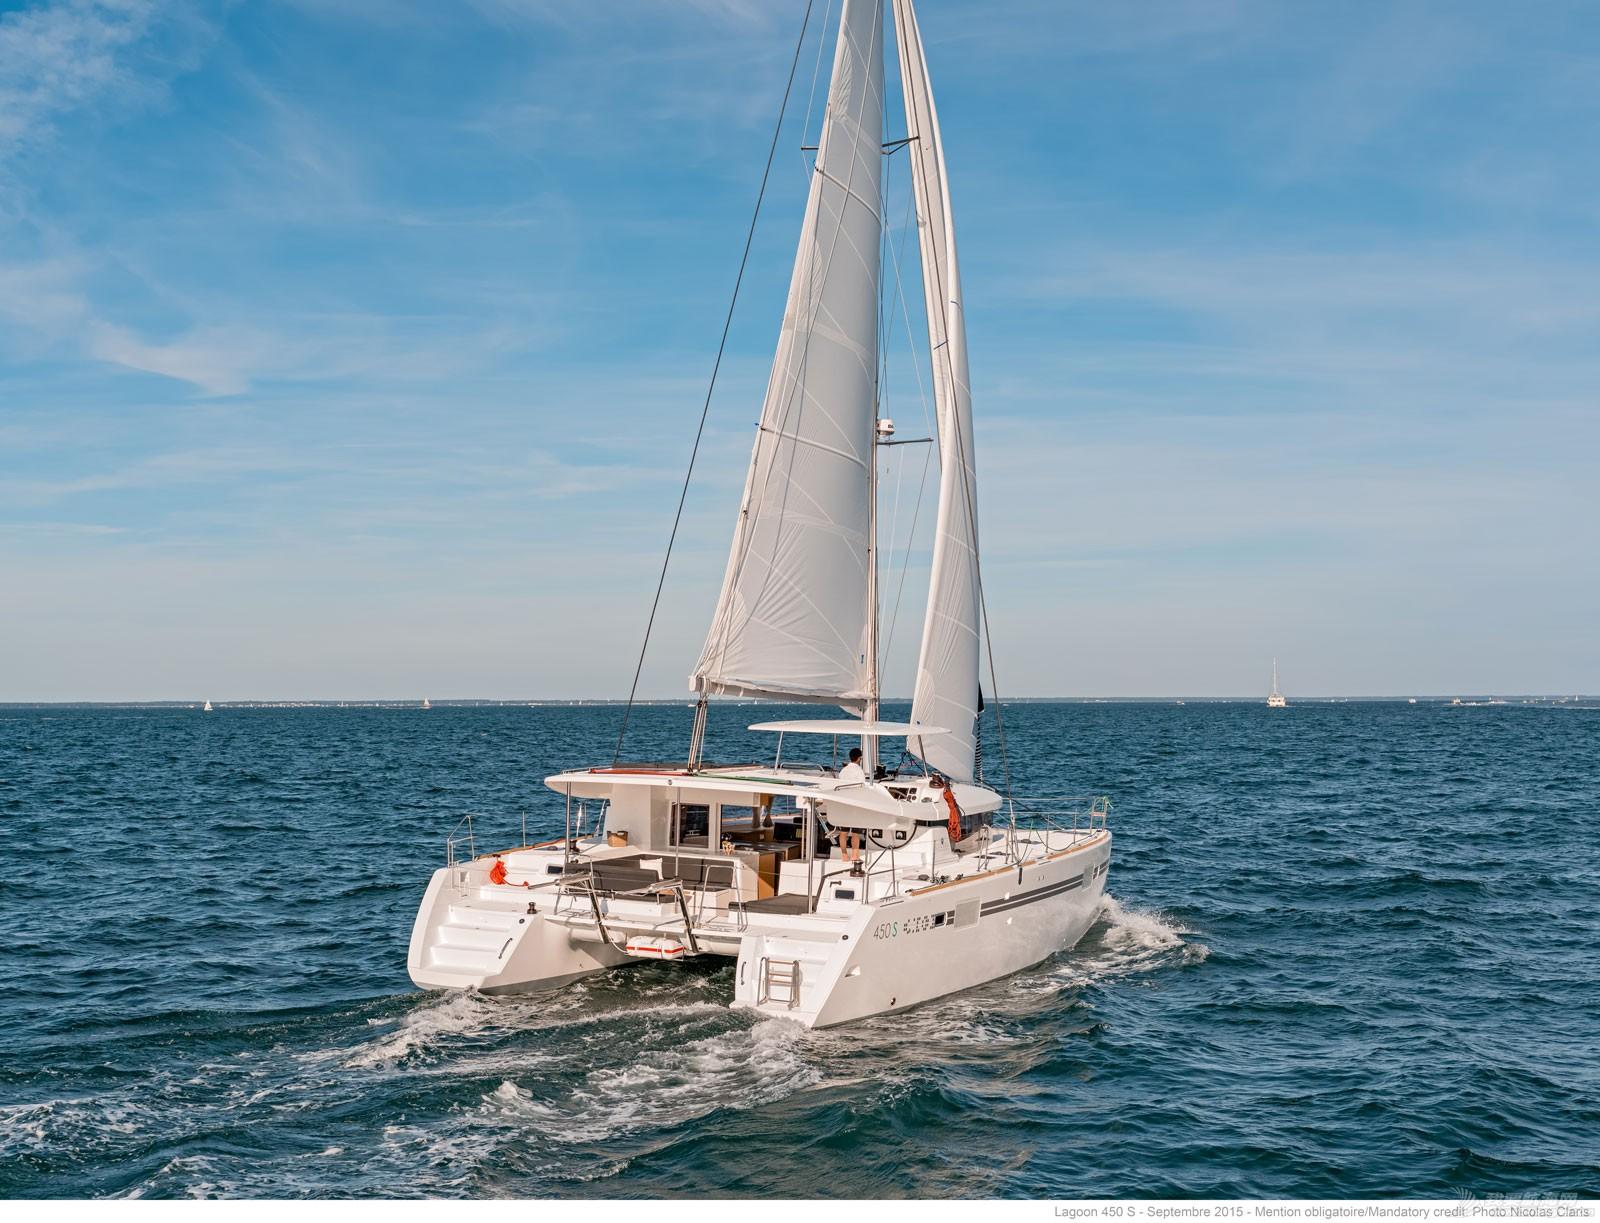 帆船 lagoon 450S 蓝高450S双体帆船 蓝高450S双体帆船